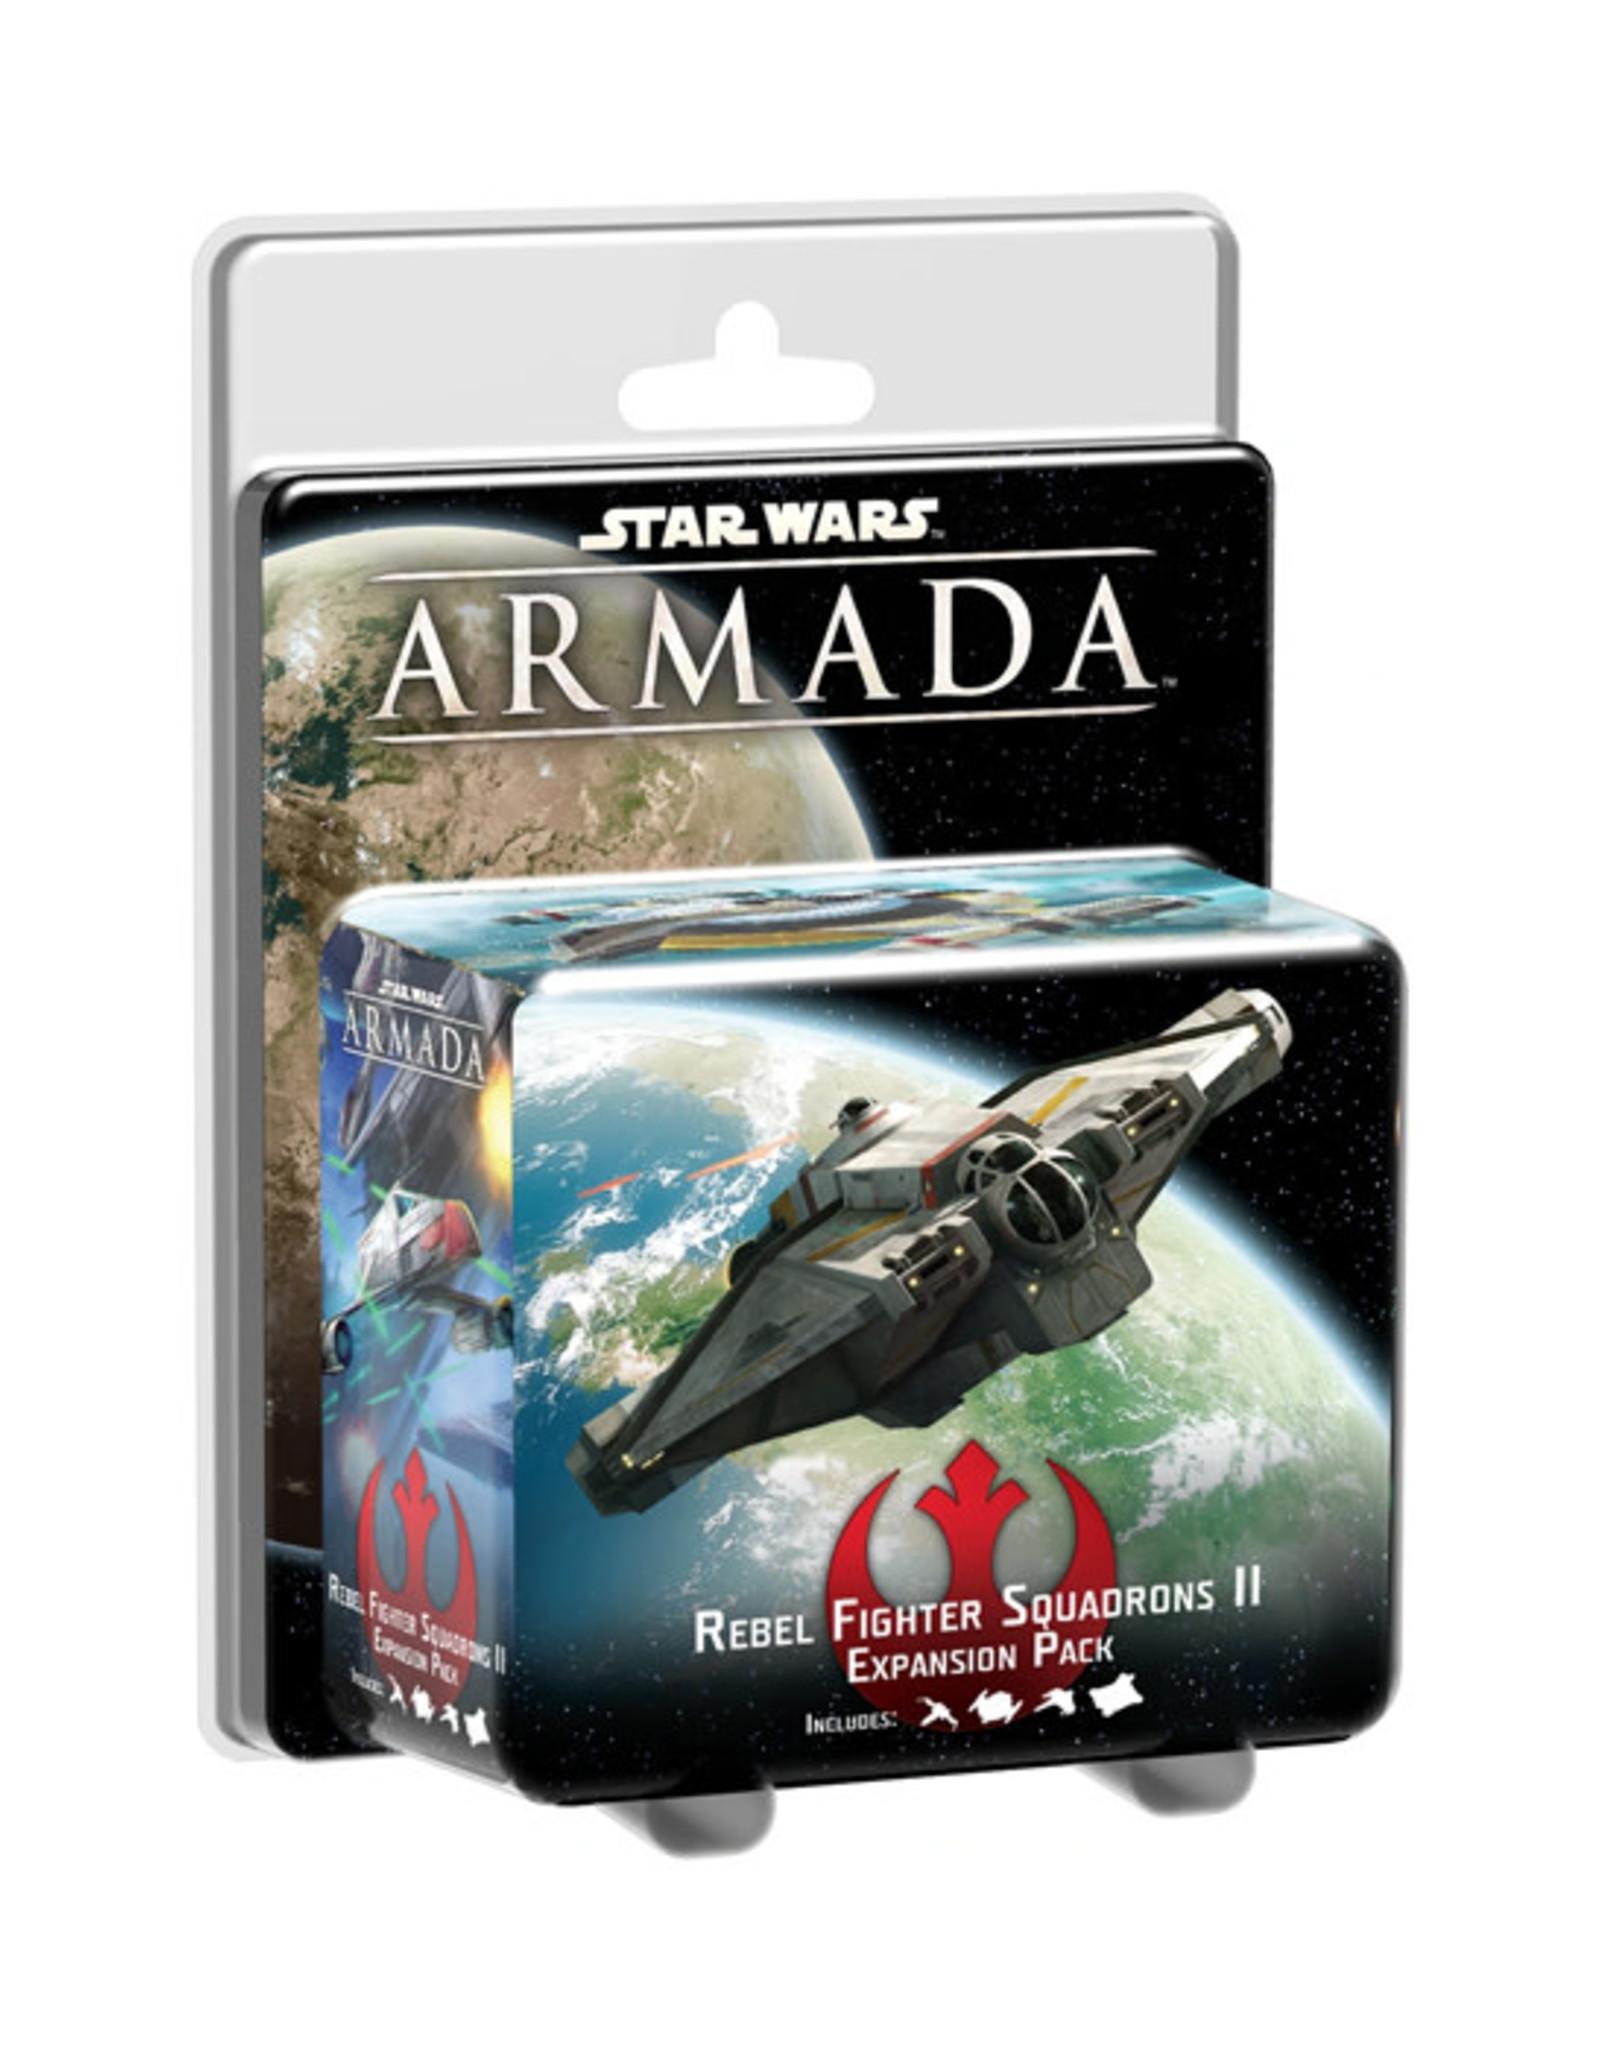 Fantasy Flight Games Star Wars: Armada - Rebel Fighter Squadrons II